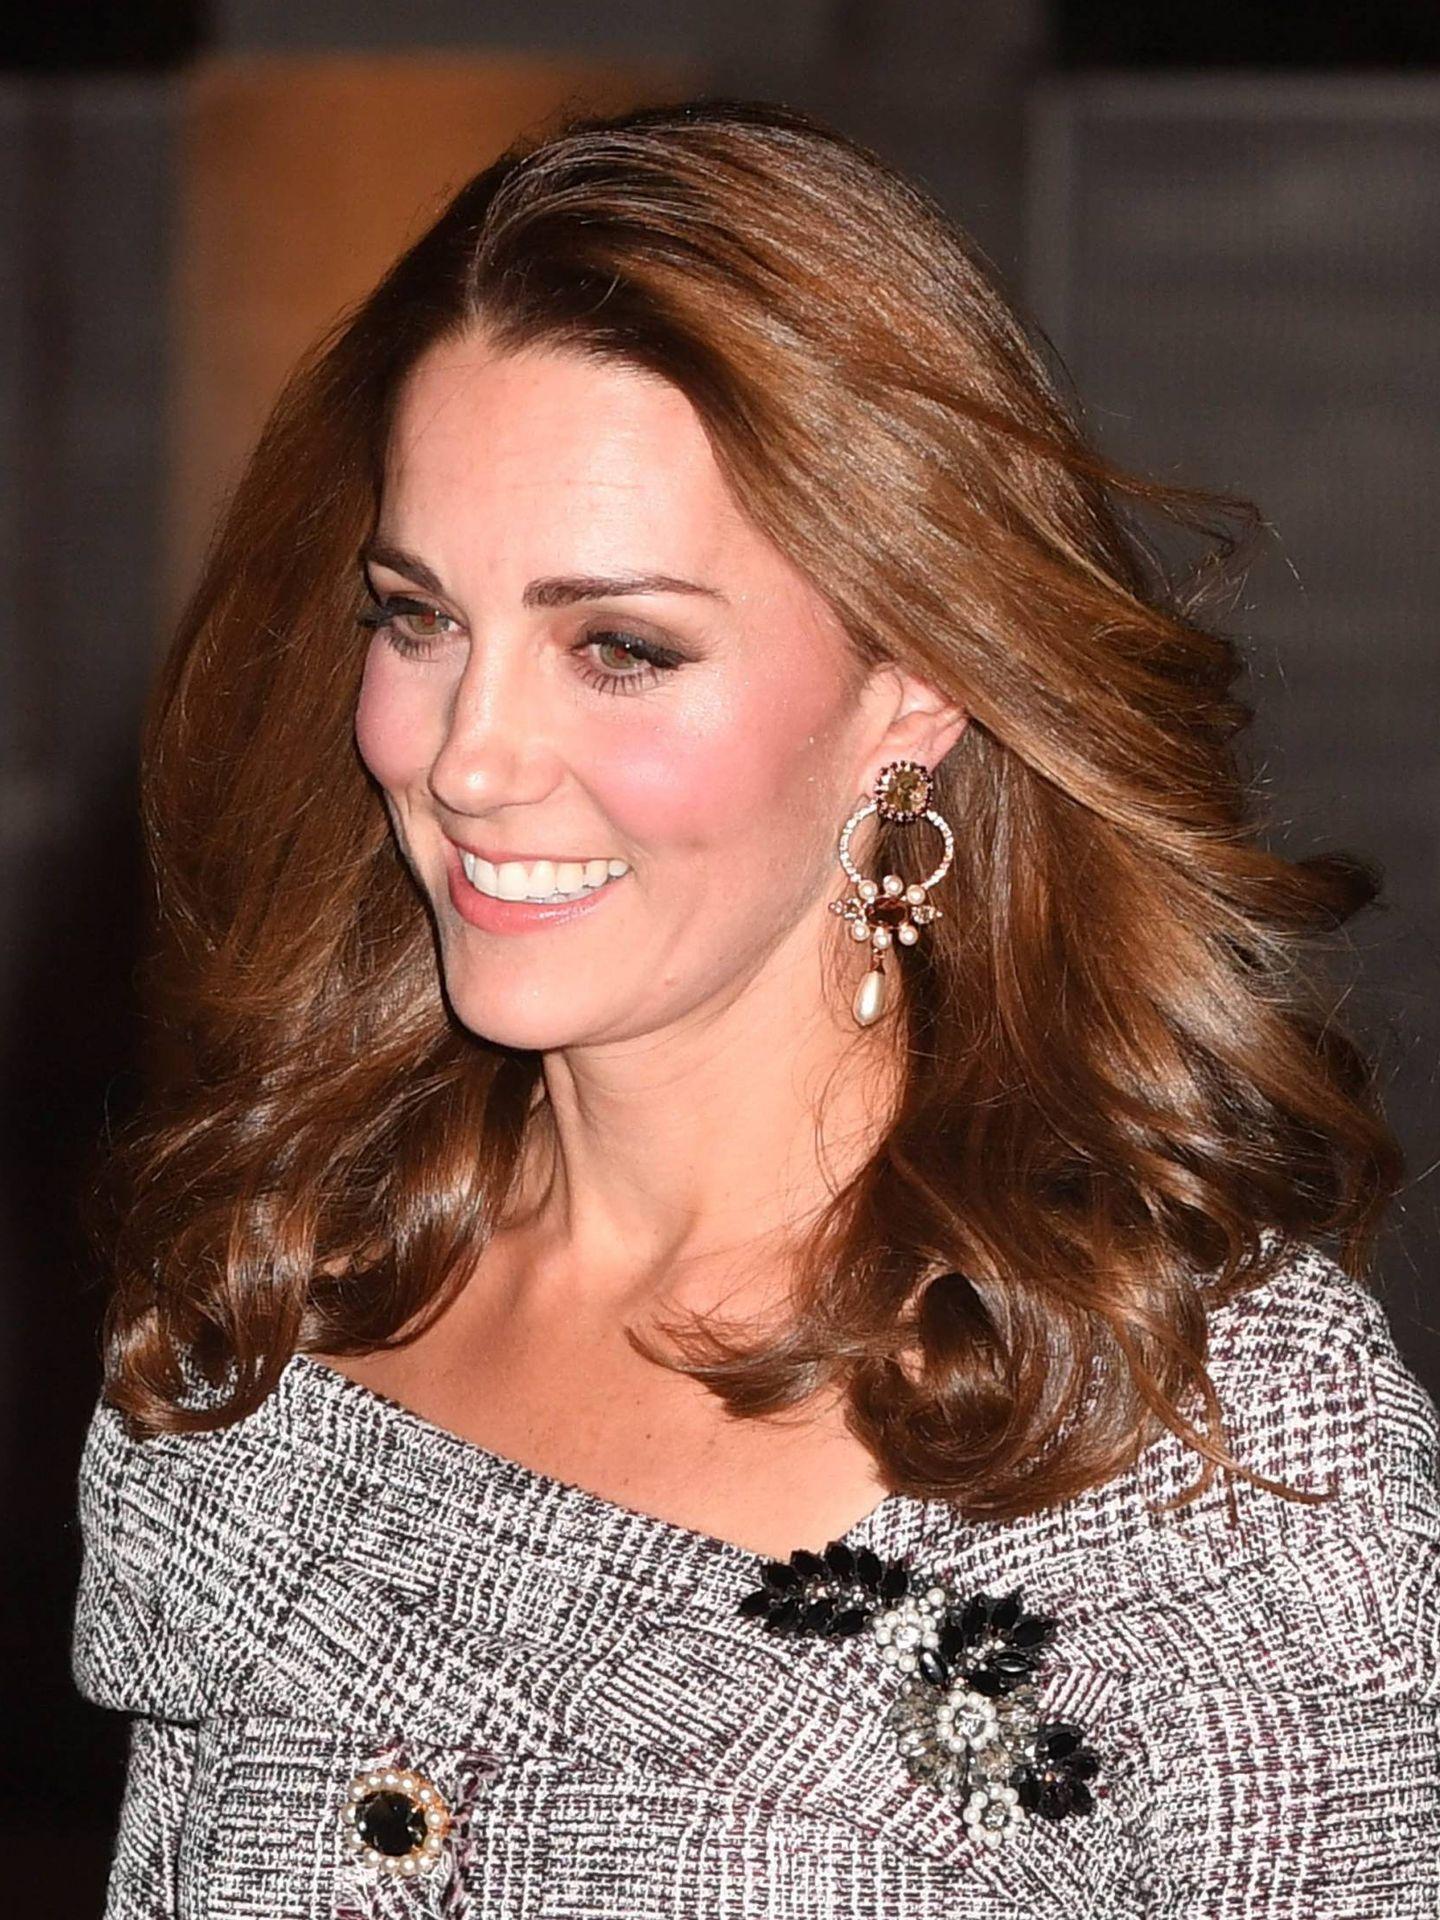 Kate Middleton, en el Albert Museum en 2020. (Cordon Press)